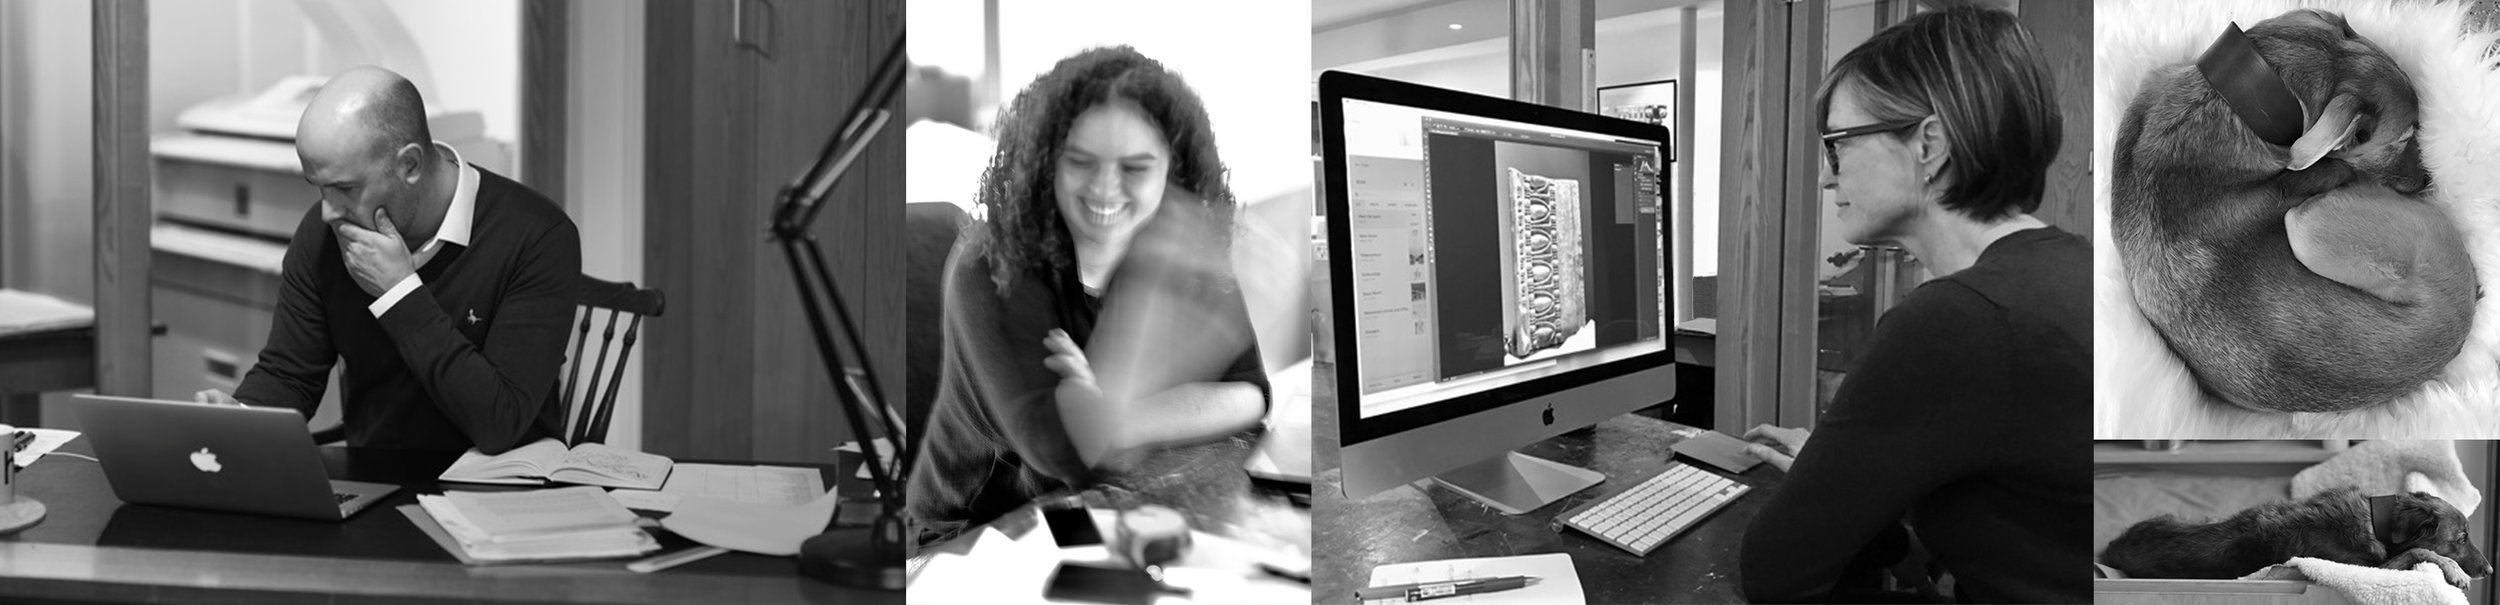 office montage.jpg